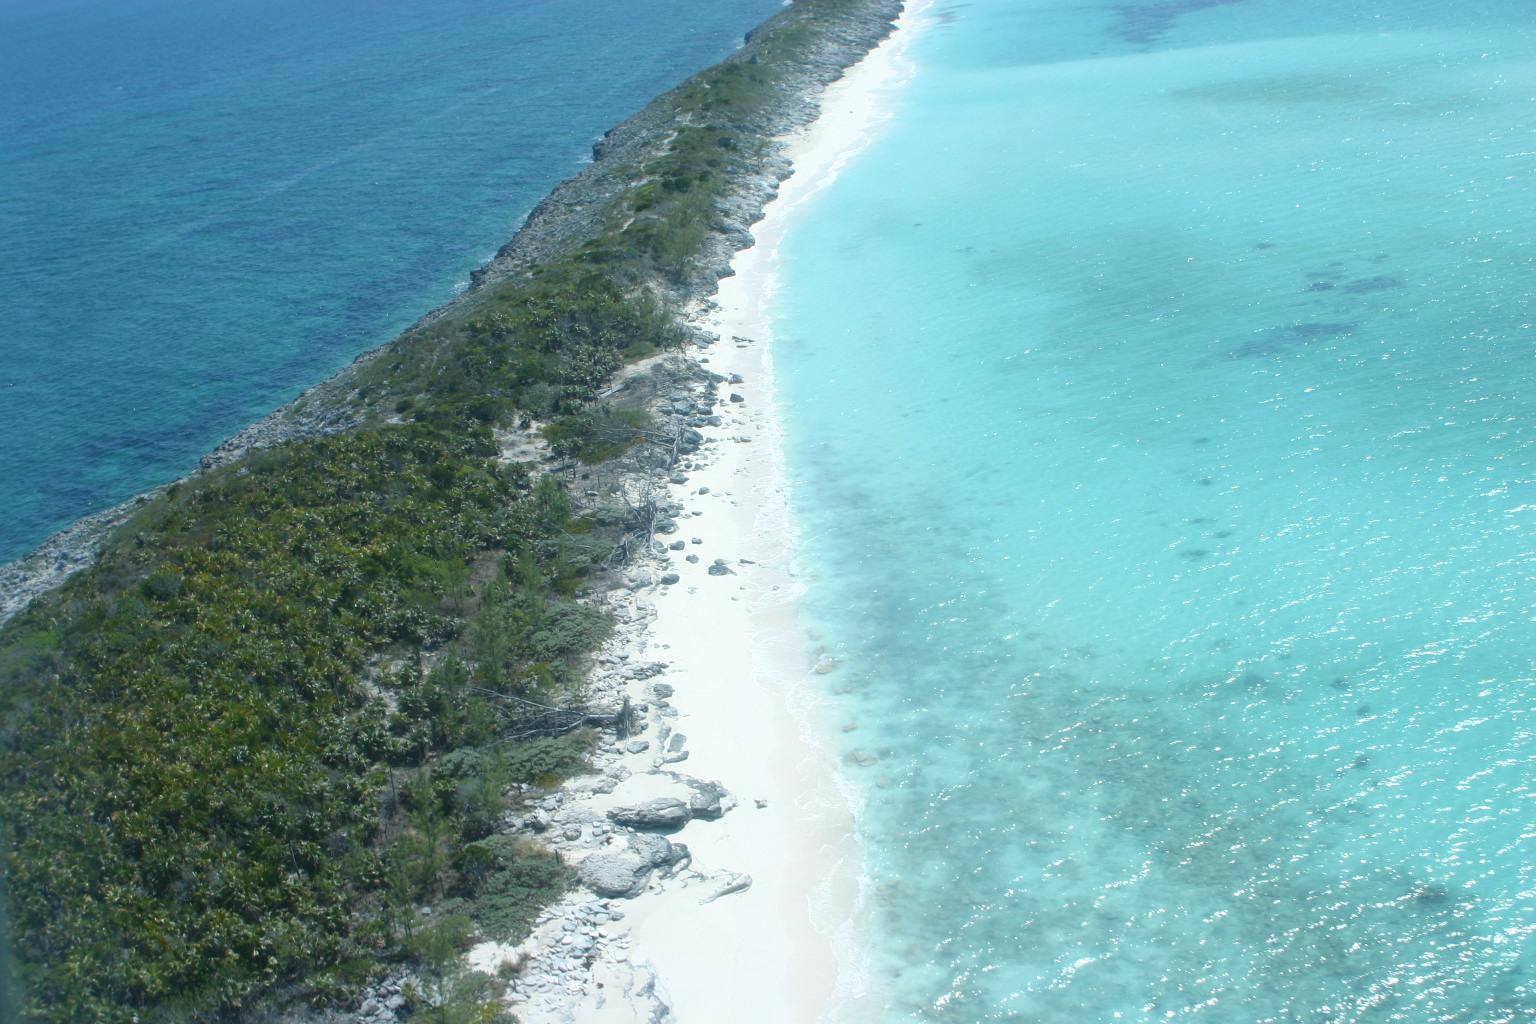 Land for Sale at Rose Island beachfront Lot Rose Island, Bahamas